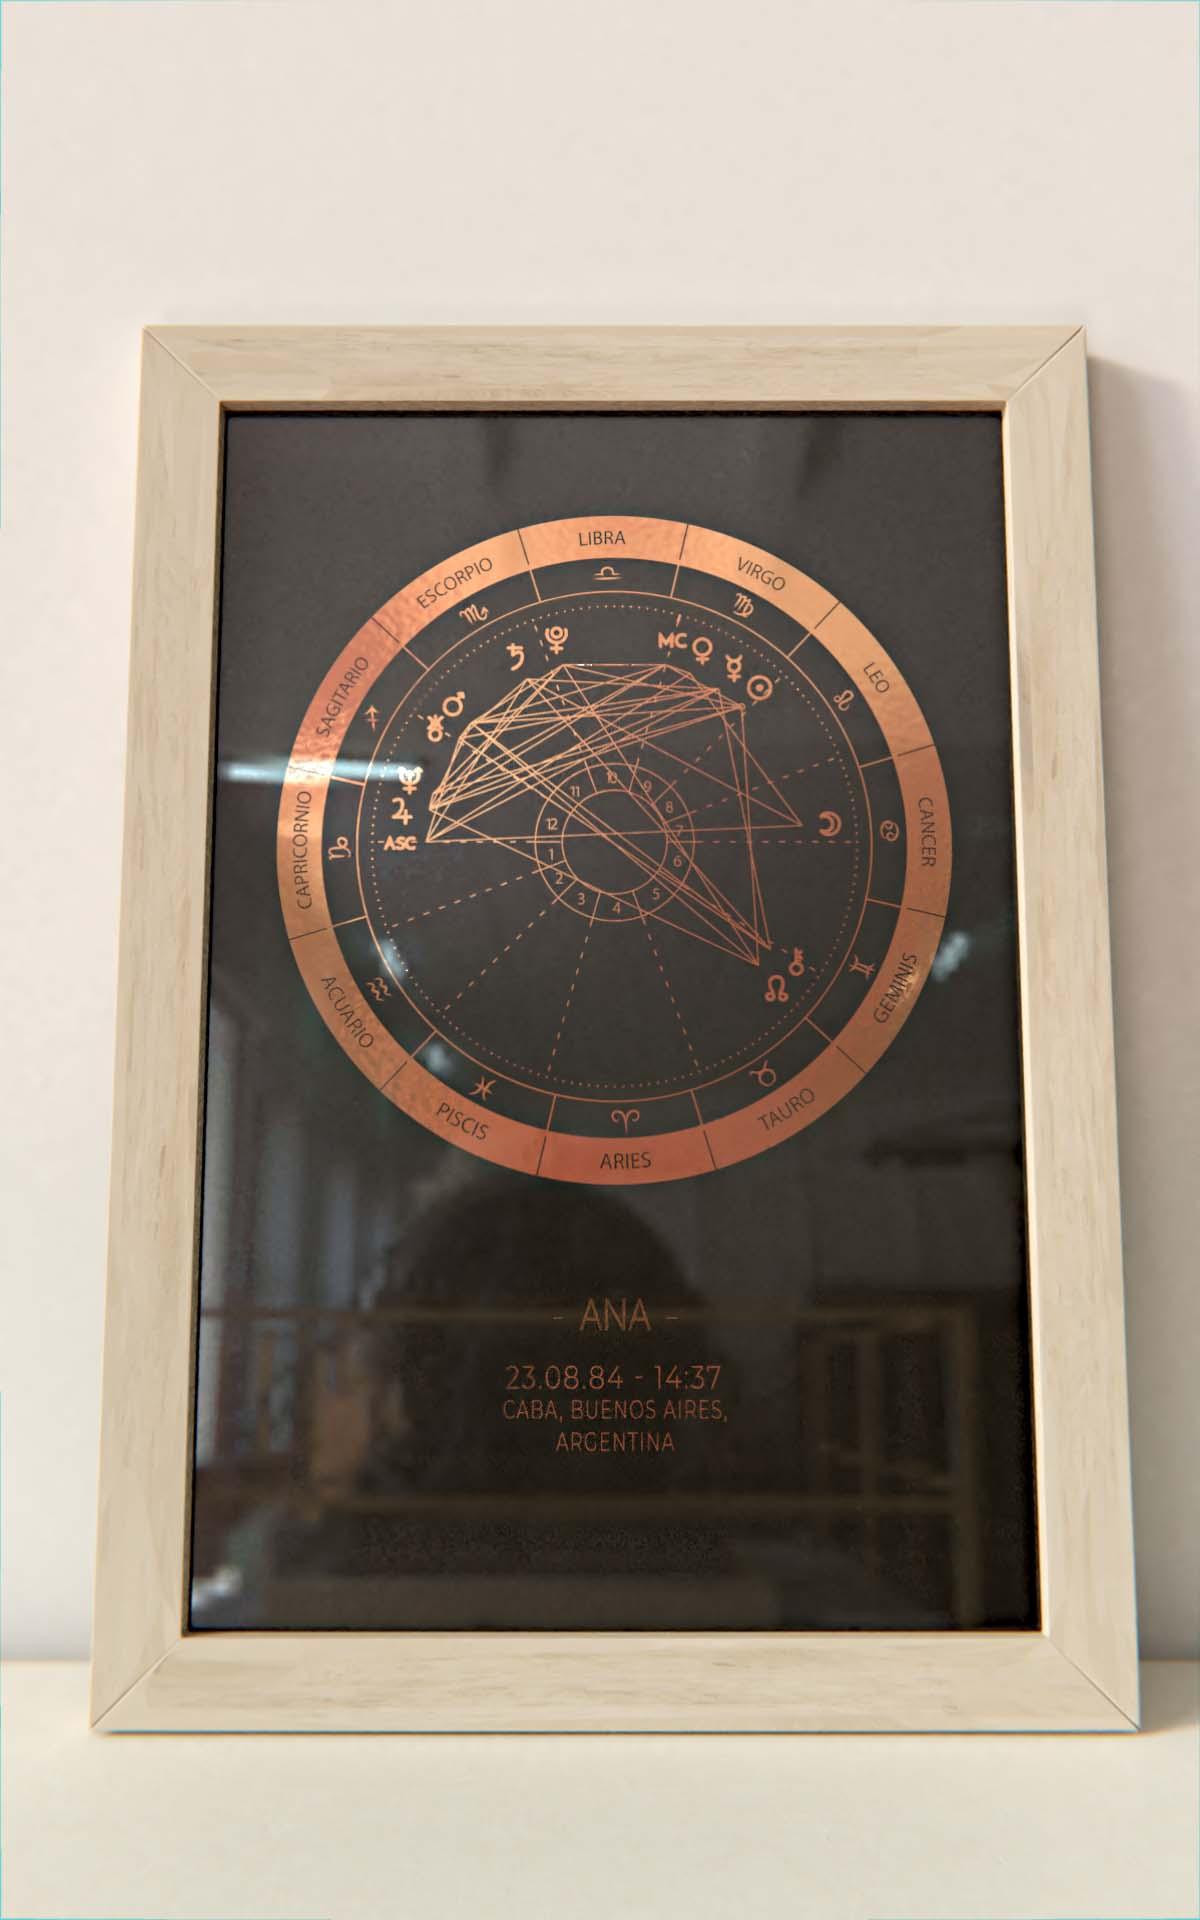 Arte Astral - Carta Astral Simple Cobre marco natural Hoja Negra